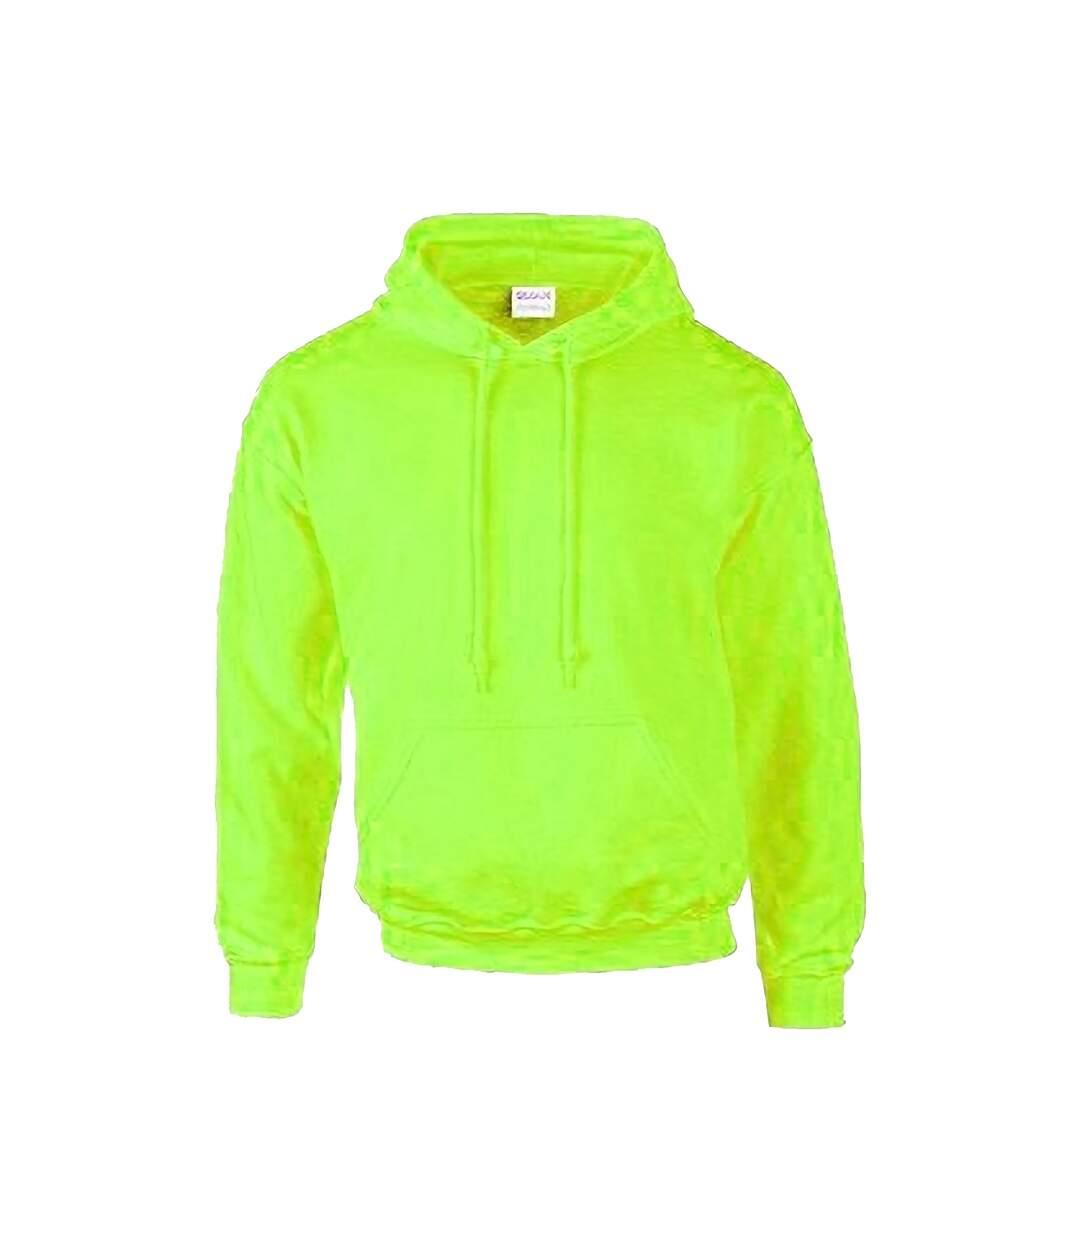 Gildan Heavyweight DryBlend Adult Unisex Hooded Sweatshirt Top / Hoodie (13 Colours) (White) - UTBC461